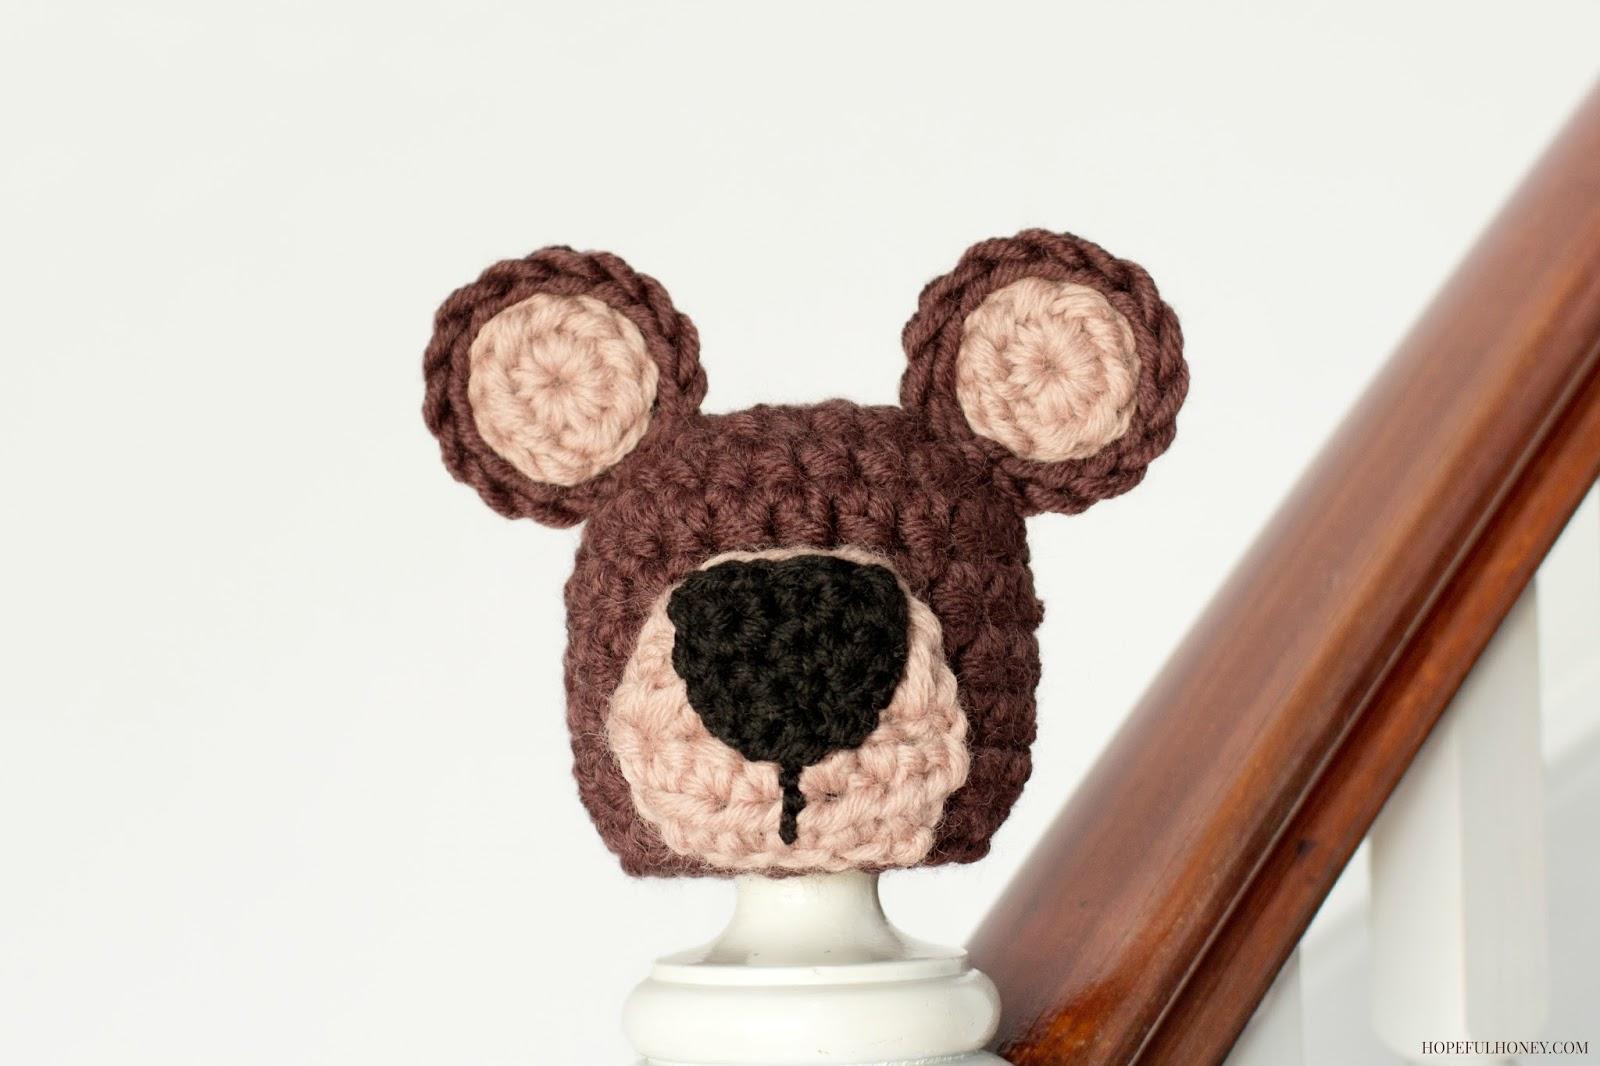 http://3.bp.blogspot.com/-oPf760bKUbU/U9CoyQI5MFI/AAAAAAAAMhg/NGwj0H0gy1E/s1600/Newborn+Teddy+Bear+Hat+Crochet+Pattern+1.jpg